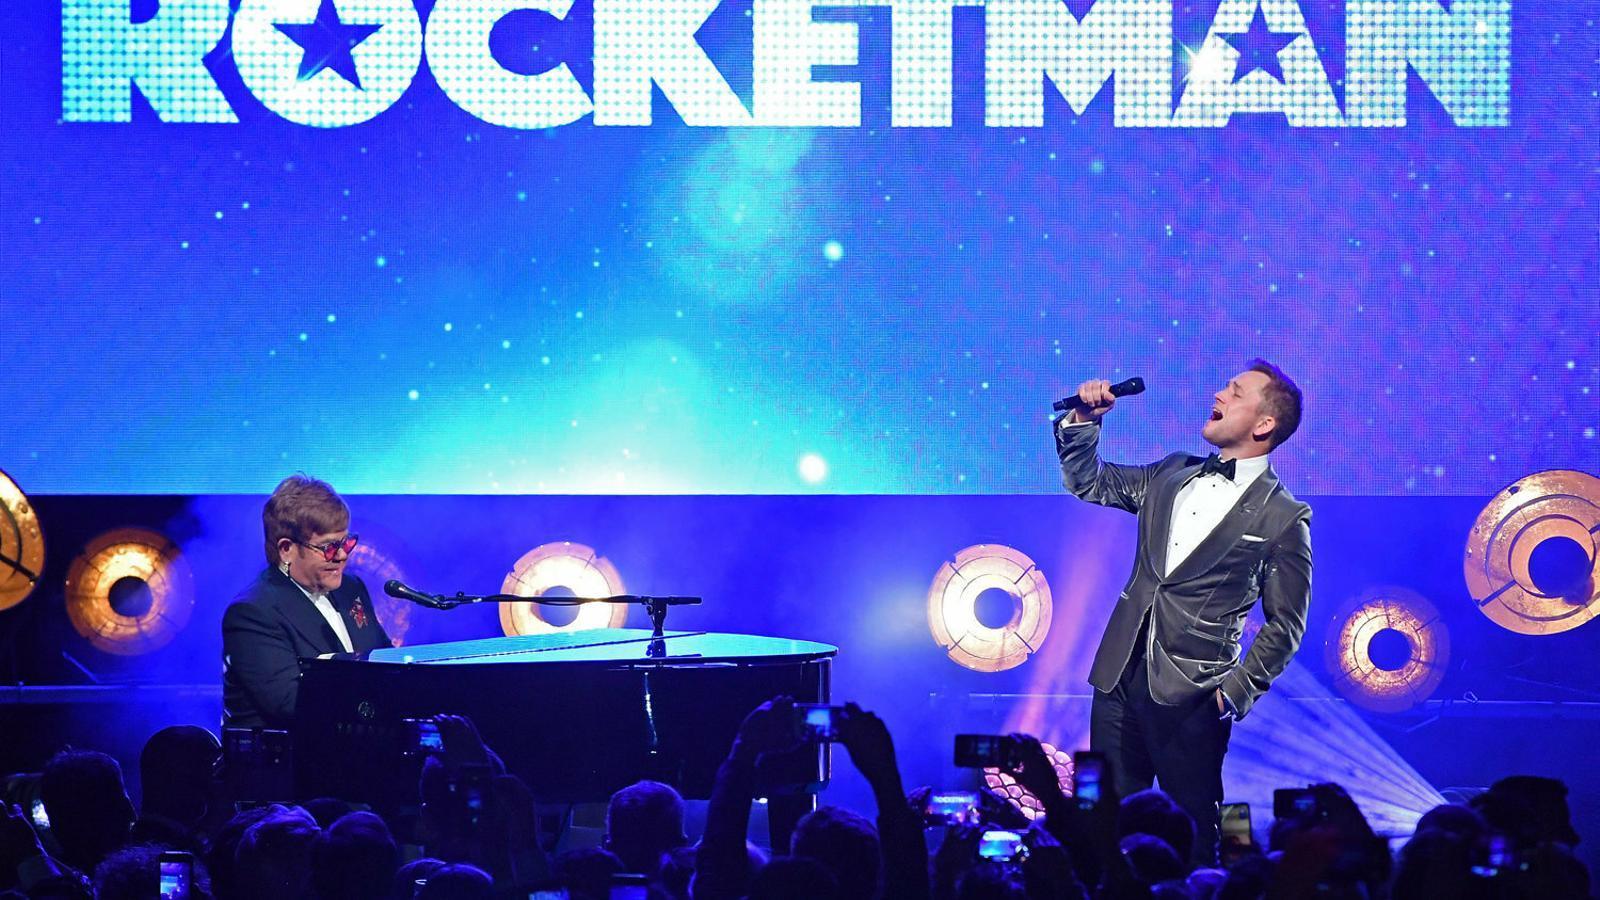 Festival de Canes: Elton John conquereix la Croisette amb 'Rocketman'